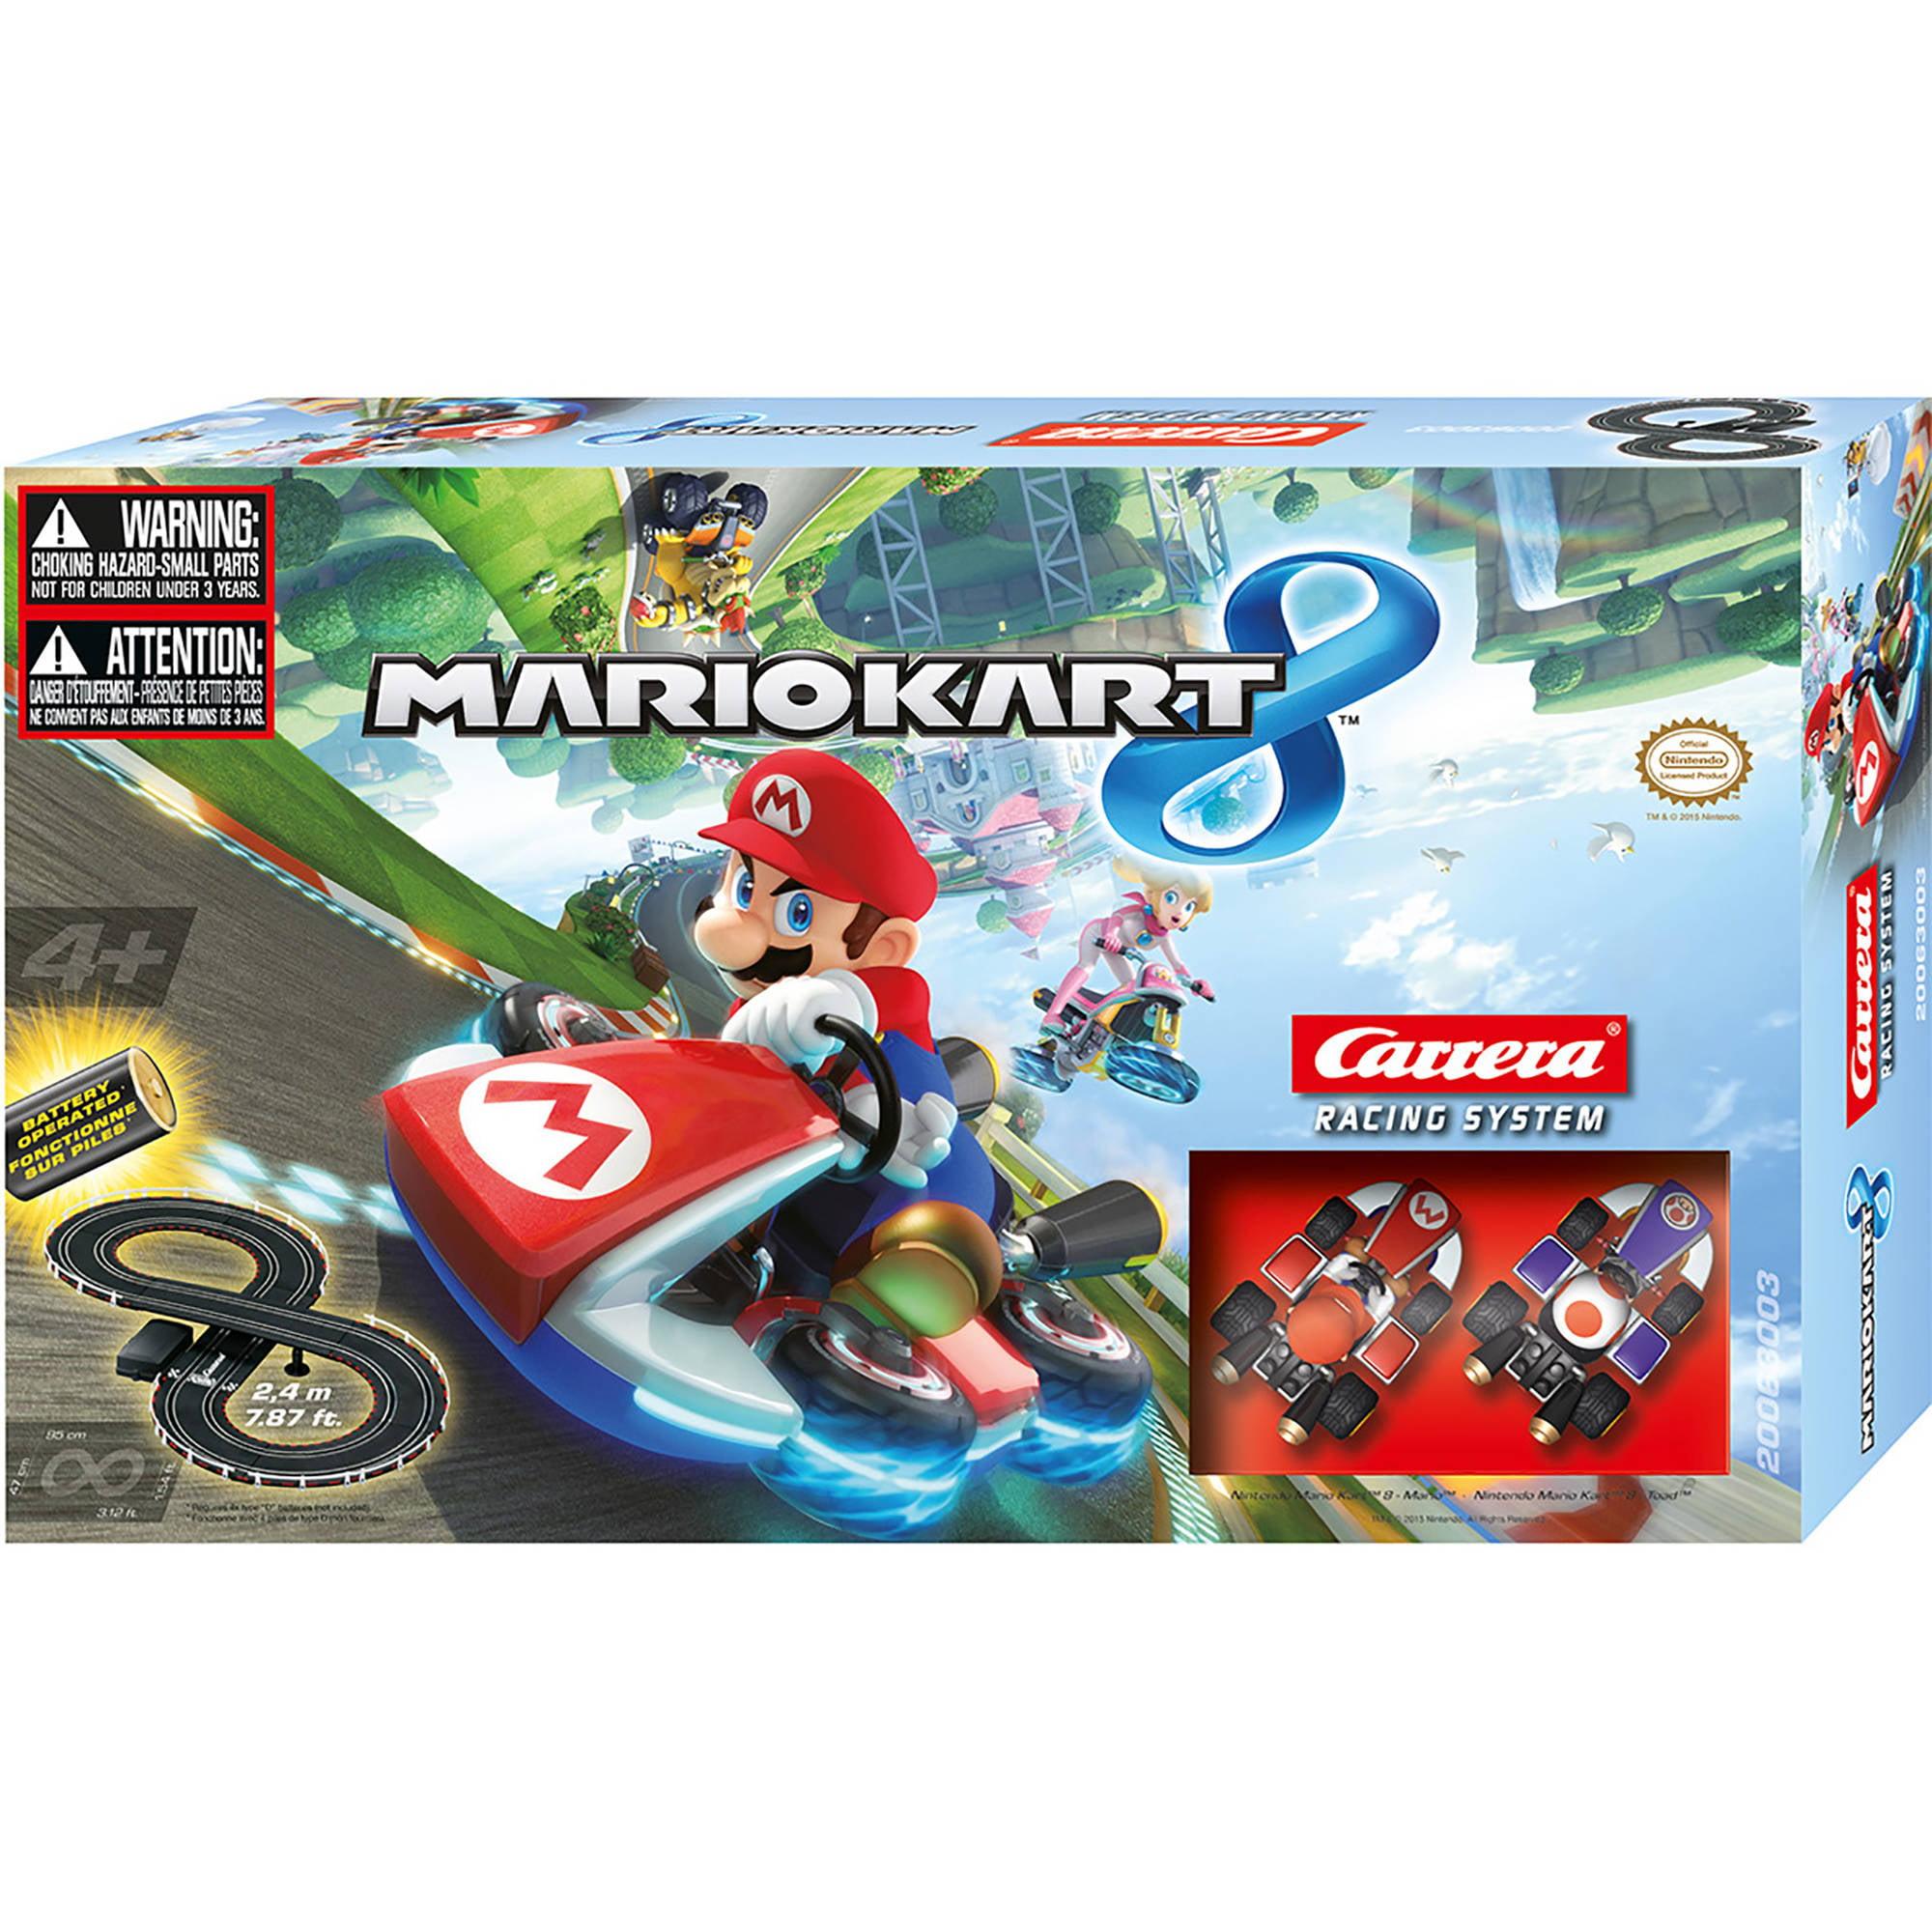 Mario Kart 8 Battery Operated Road Race Set Walmart Com